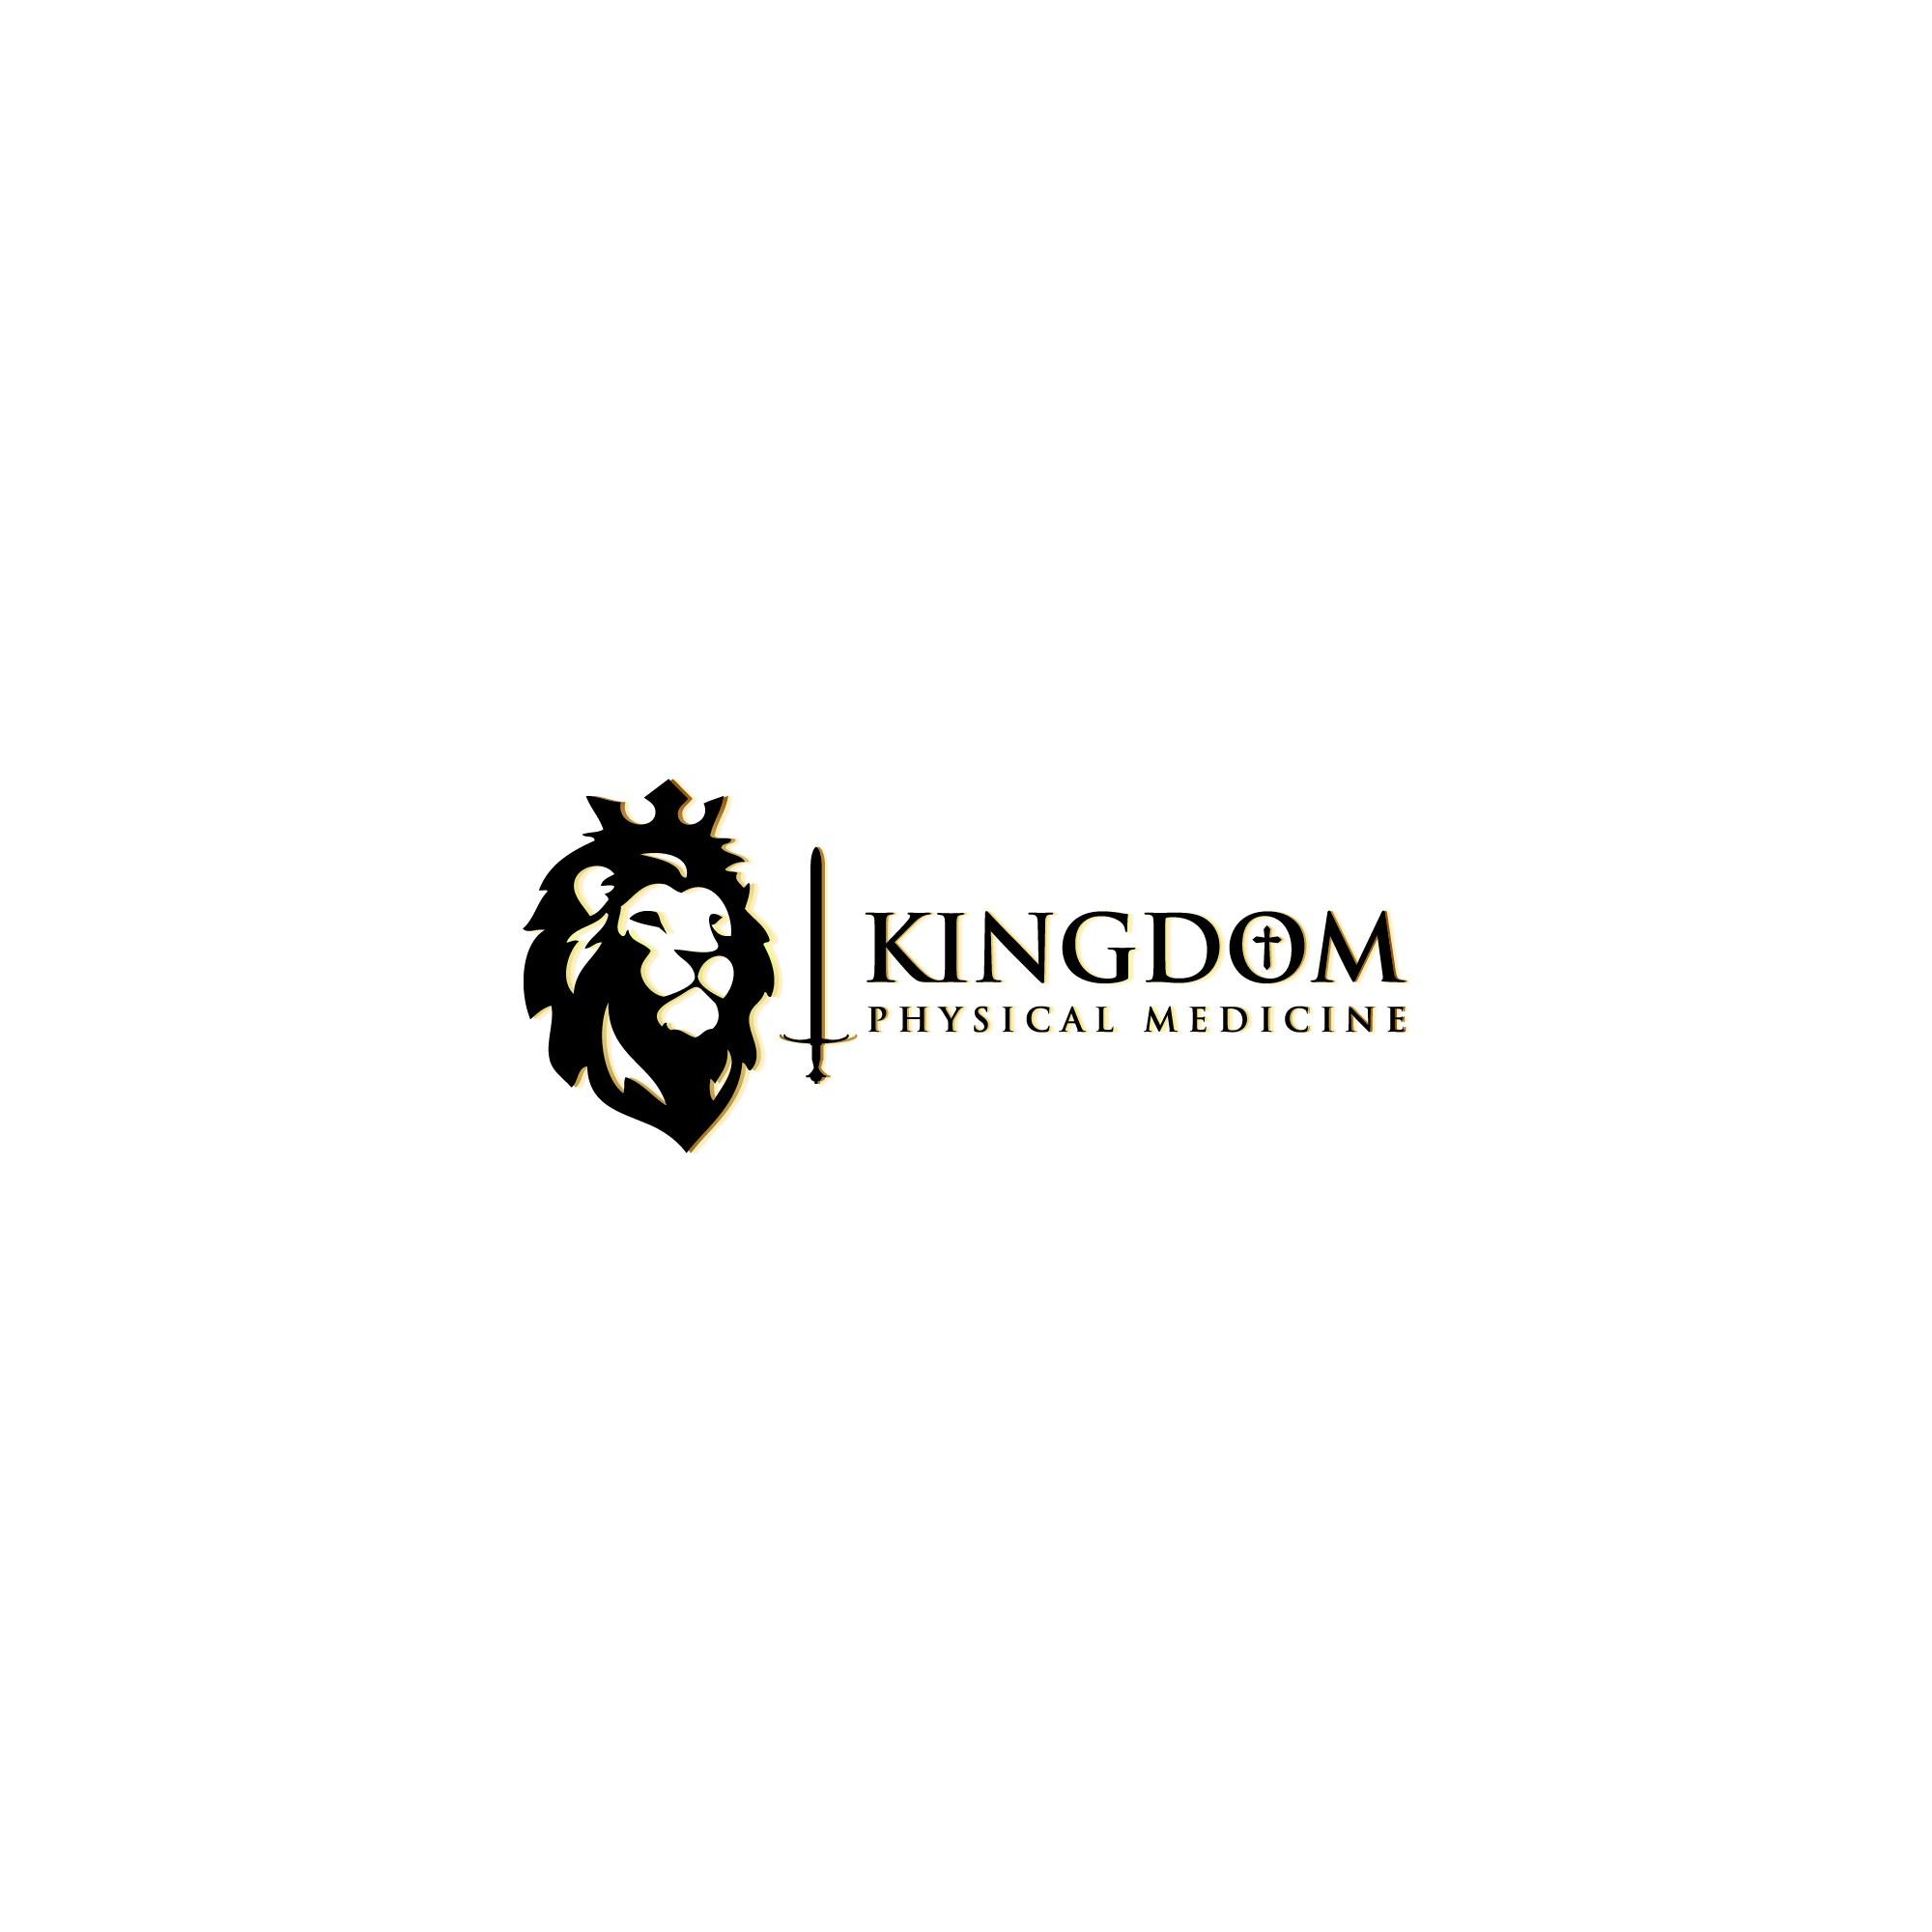 Create a Christ-focused logo for Kingdom Physical Medicine